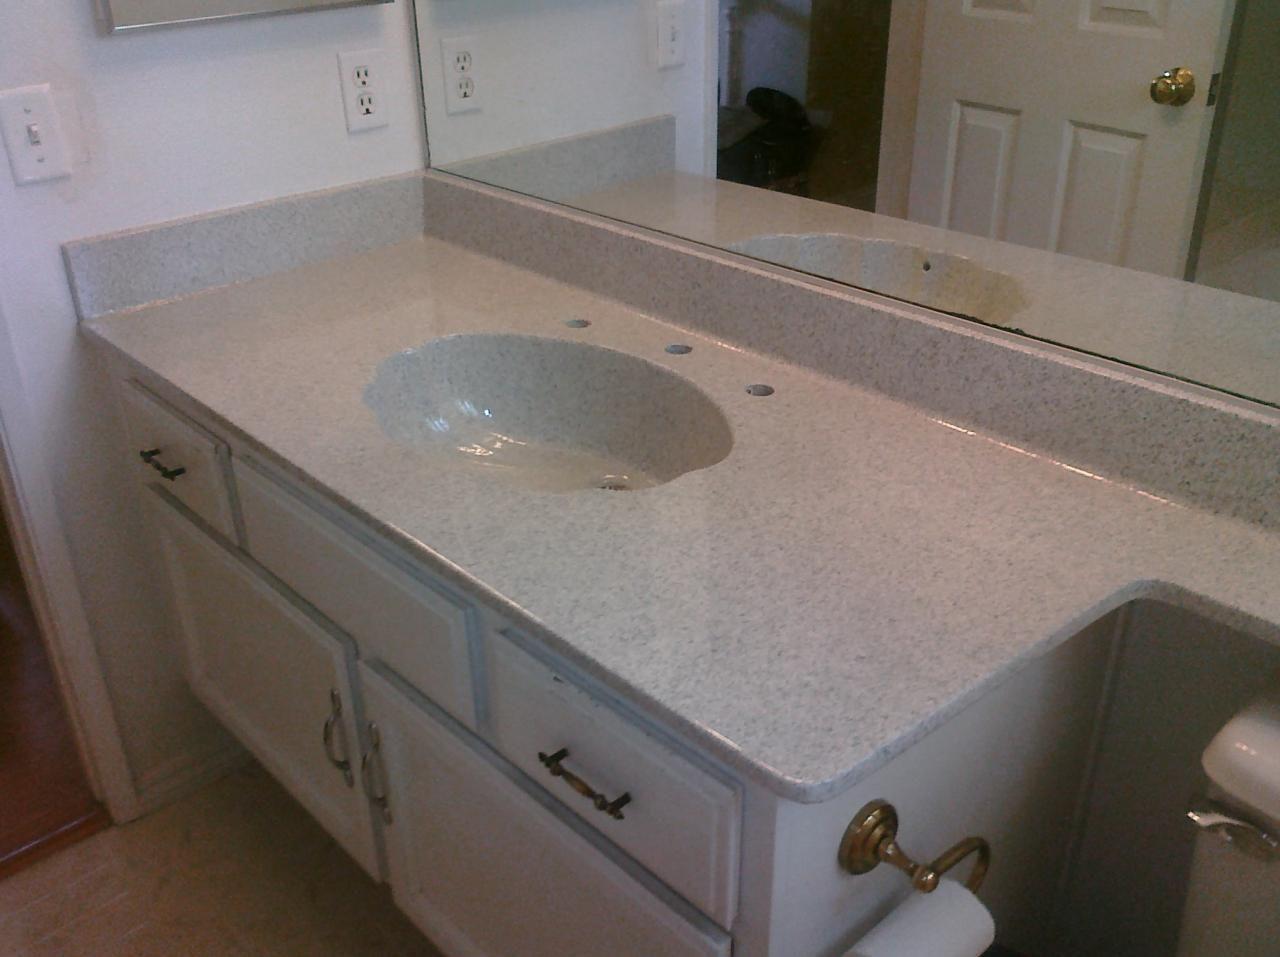 PKB Reglazing  Cultured Marble Countertop  Sink Combo